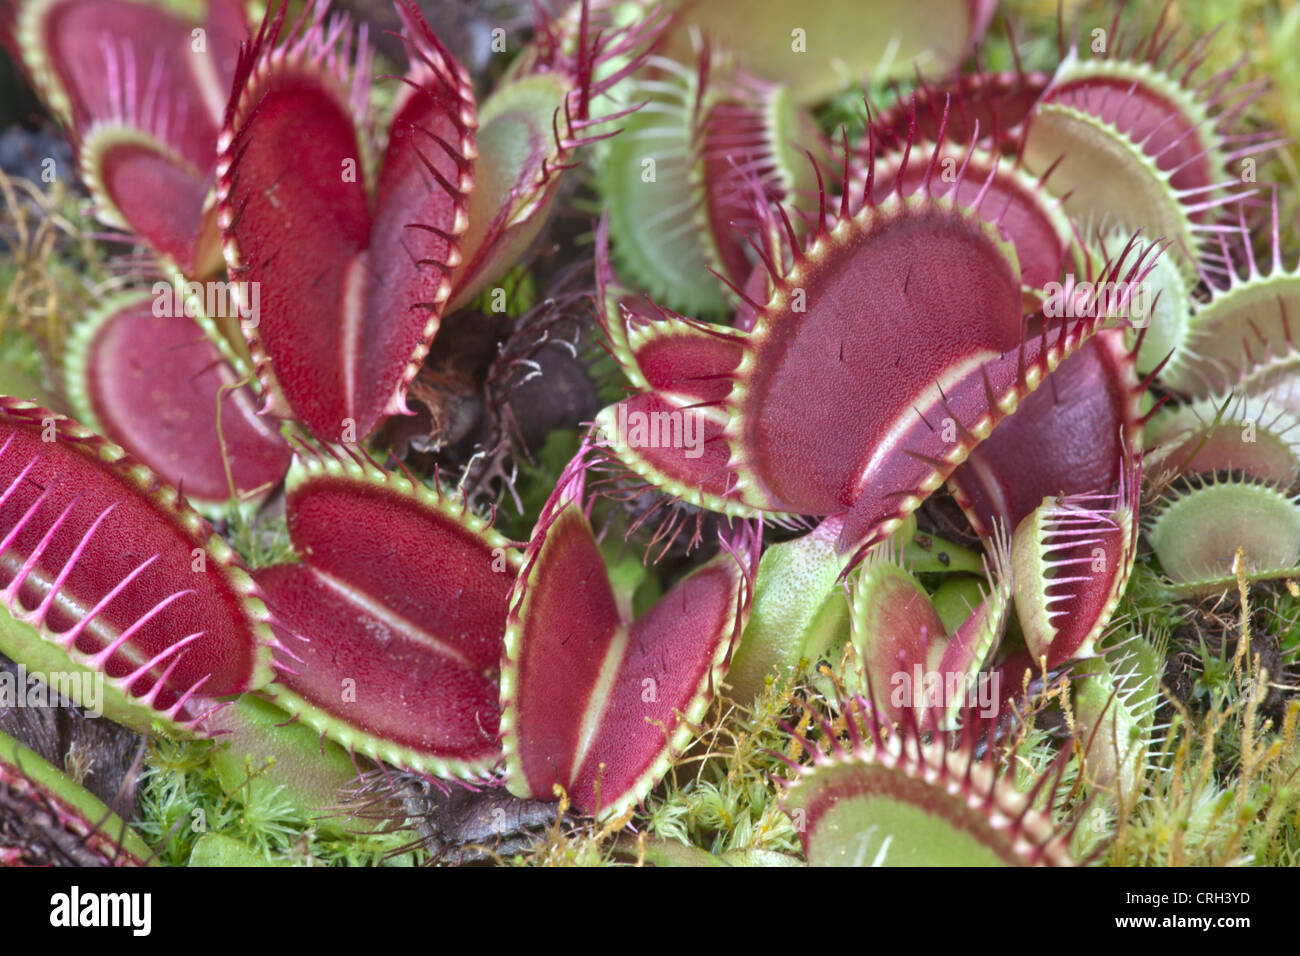 Venus Flytrap ' B52' plantes croissant 'Dionaea muscipula'. Banque D'Images